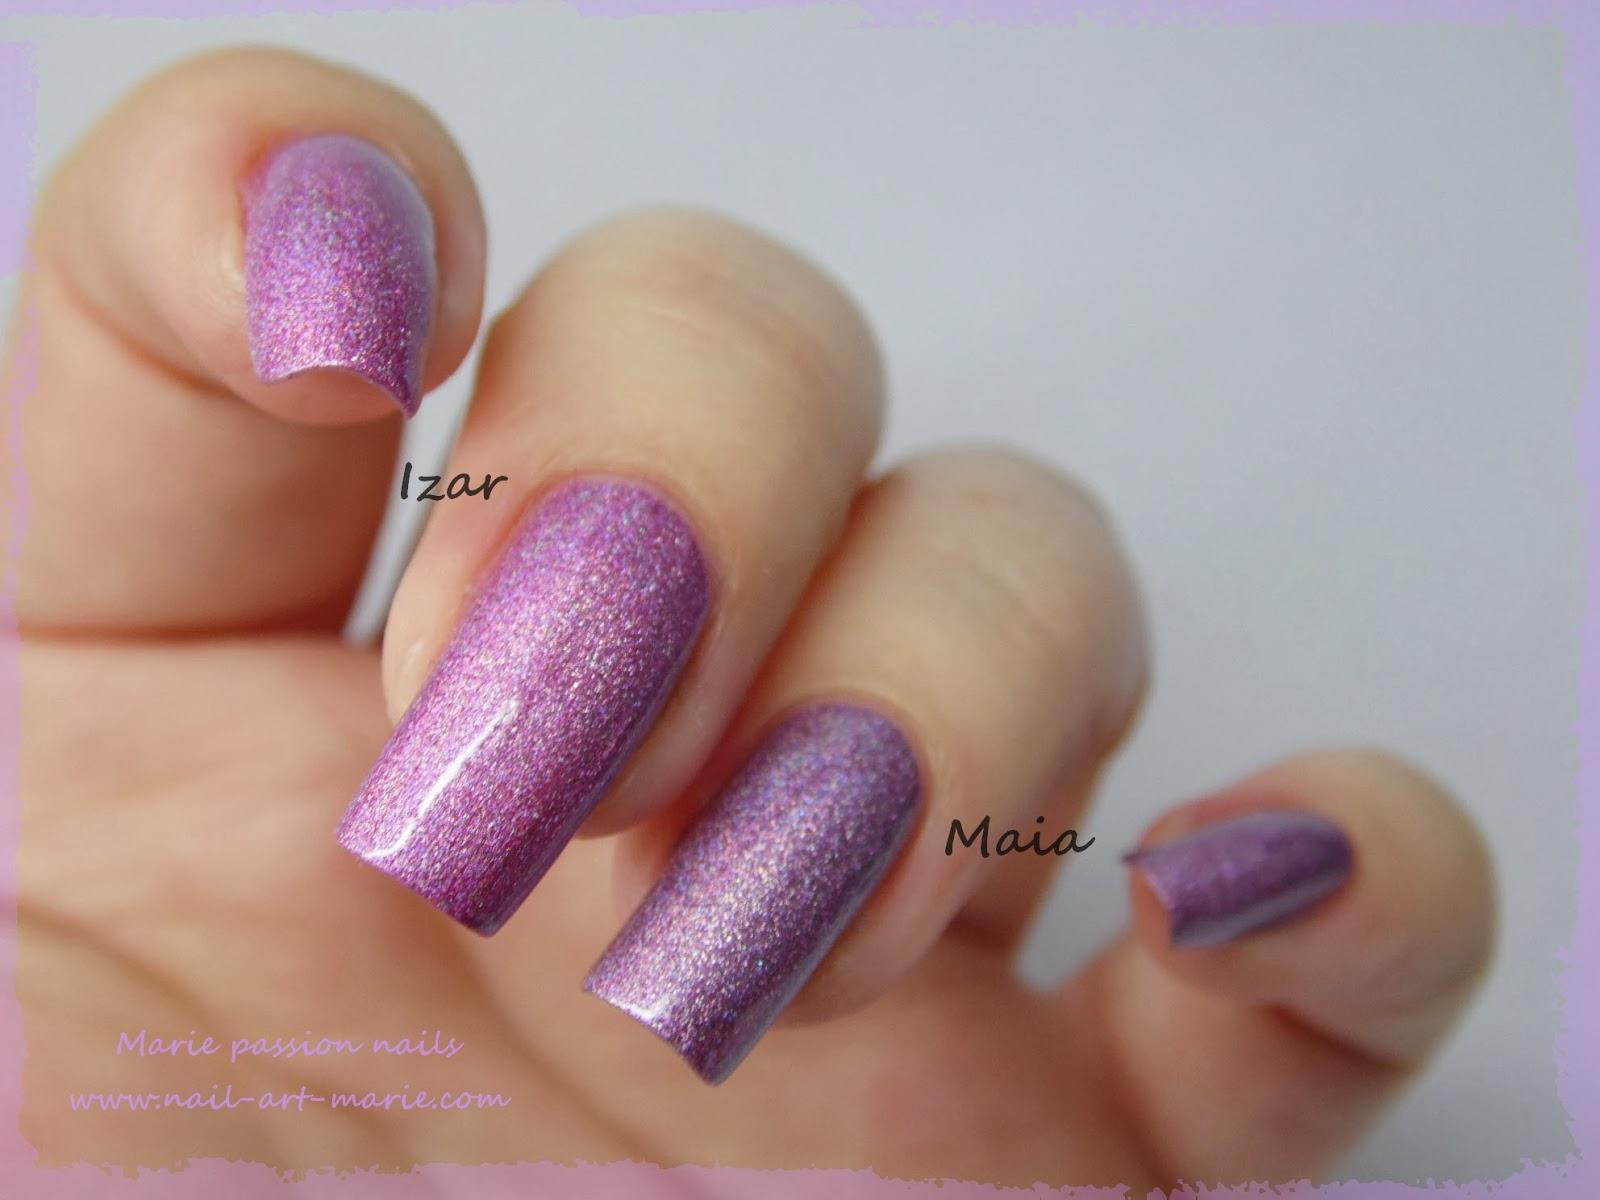 LM Cosmetic Izar et Maia1